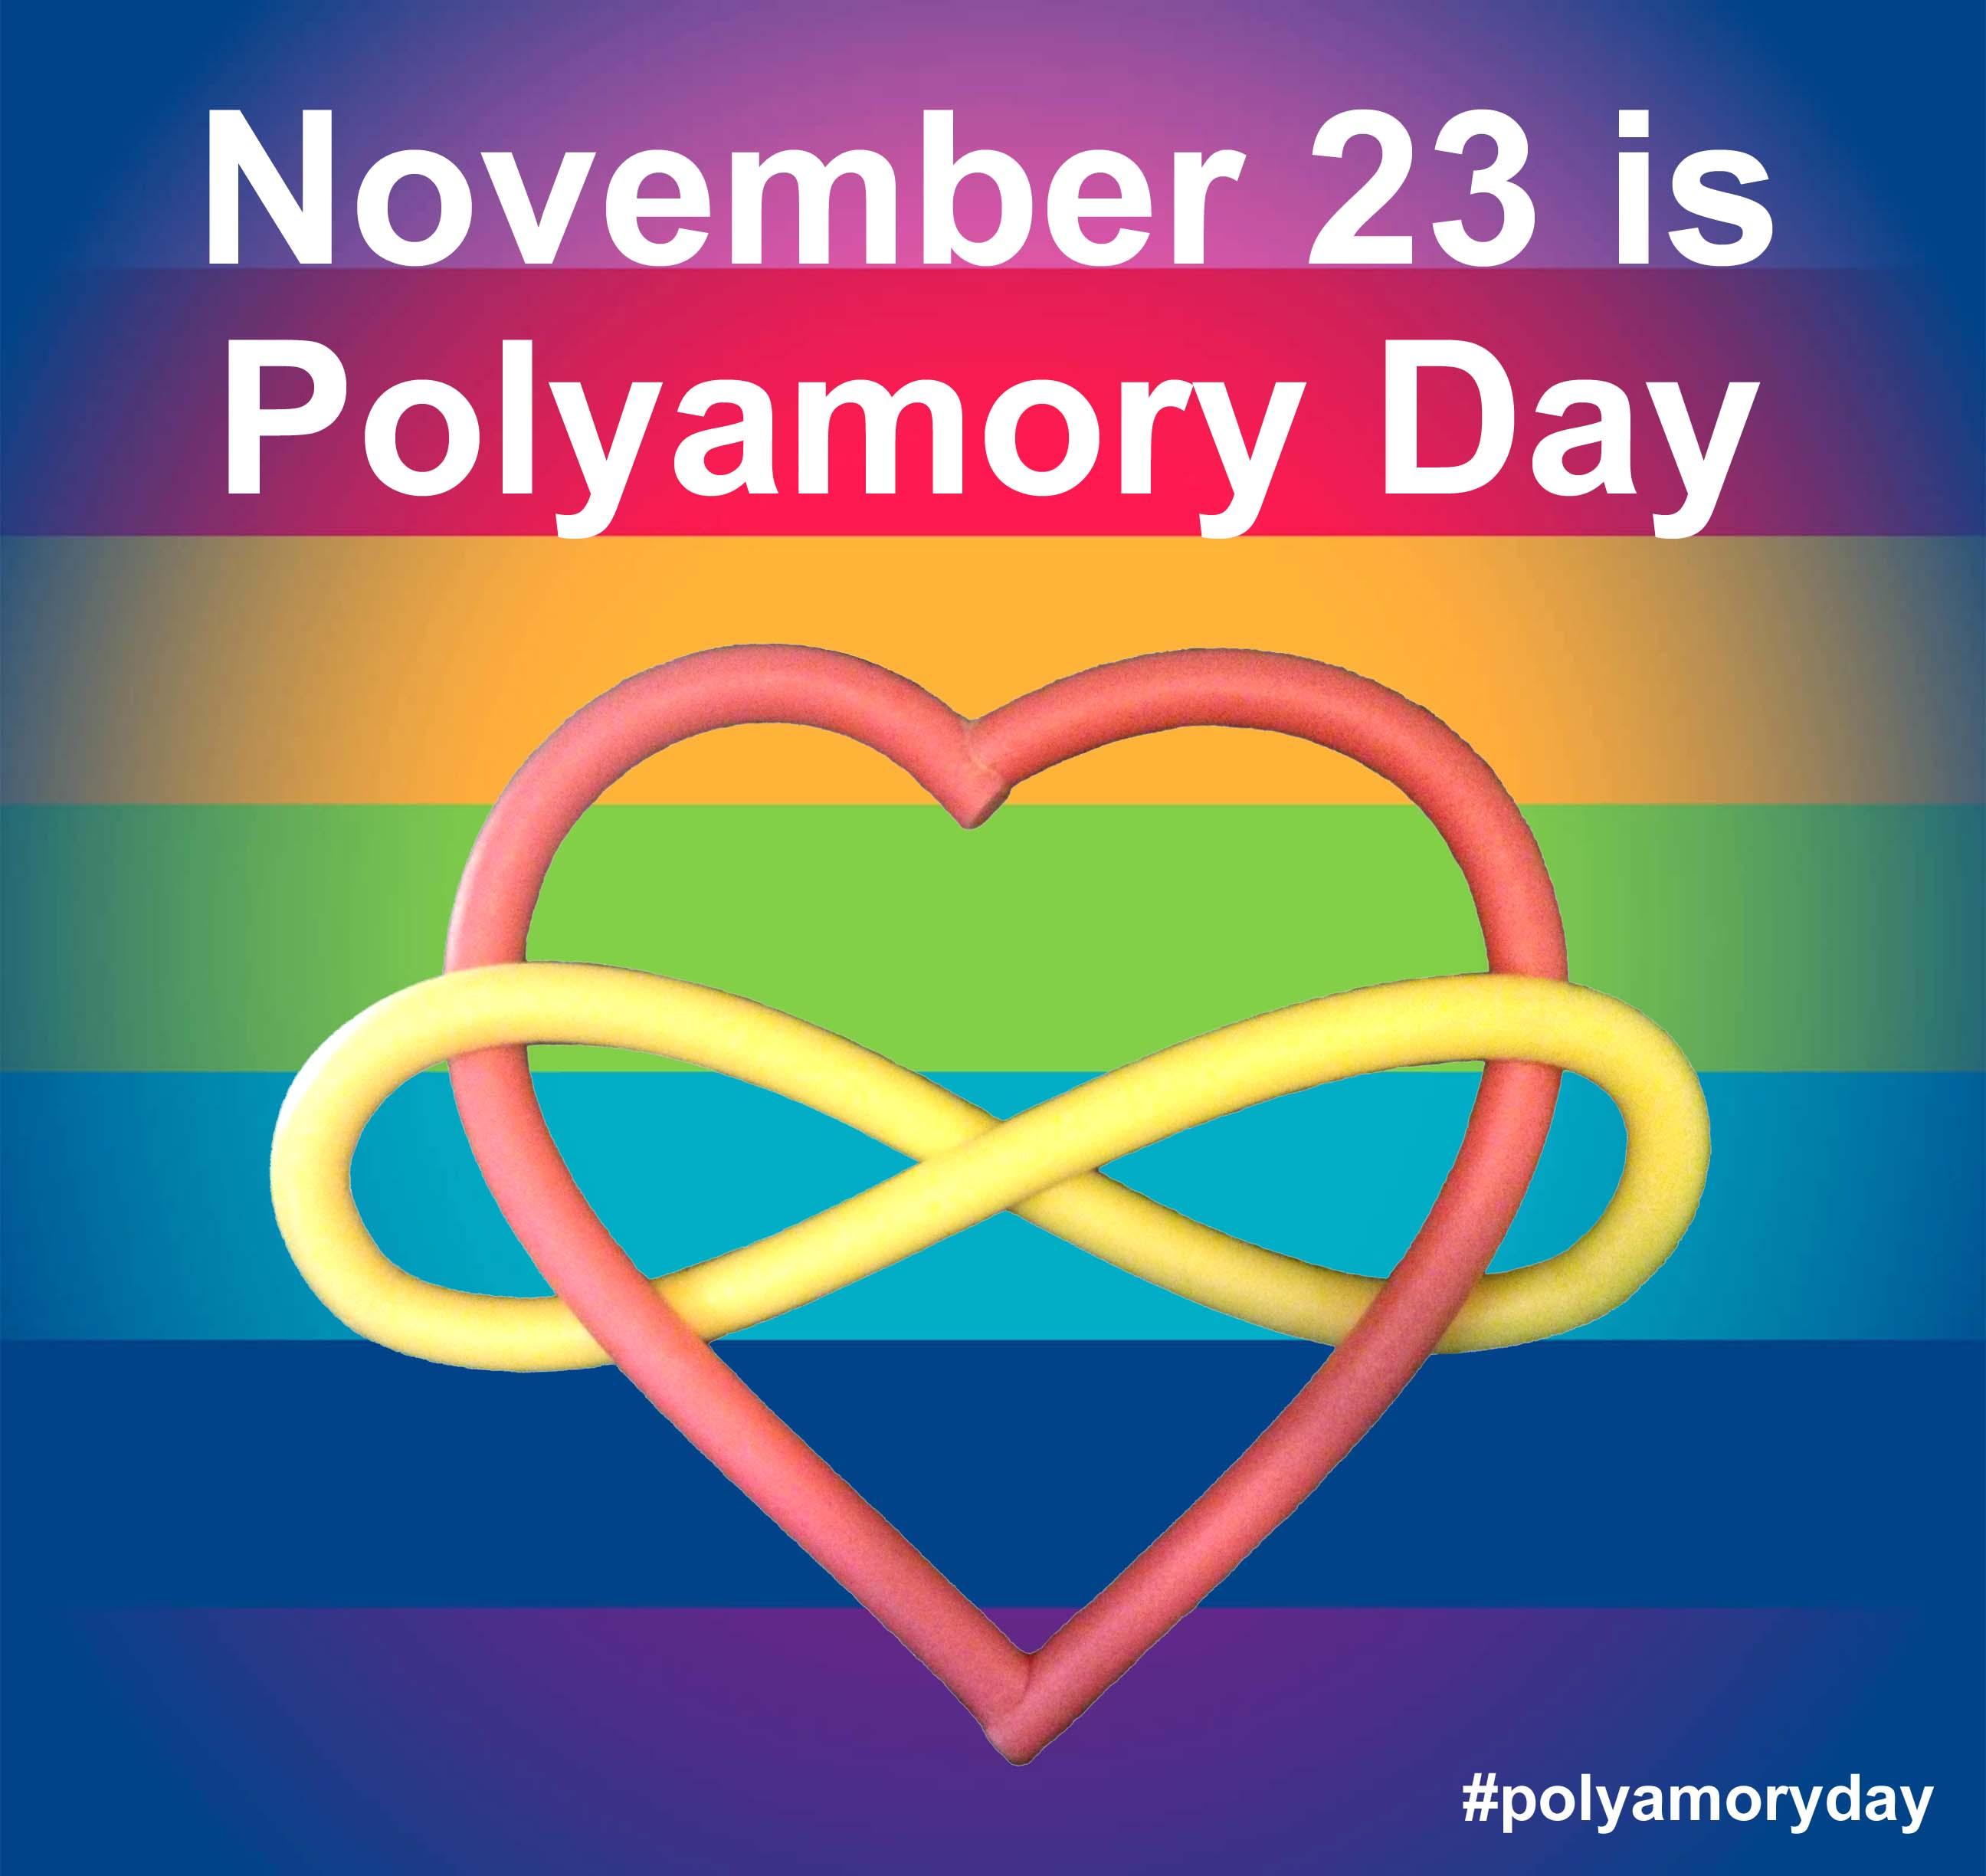 Polyamory Day